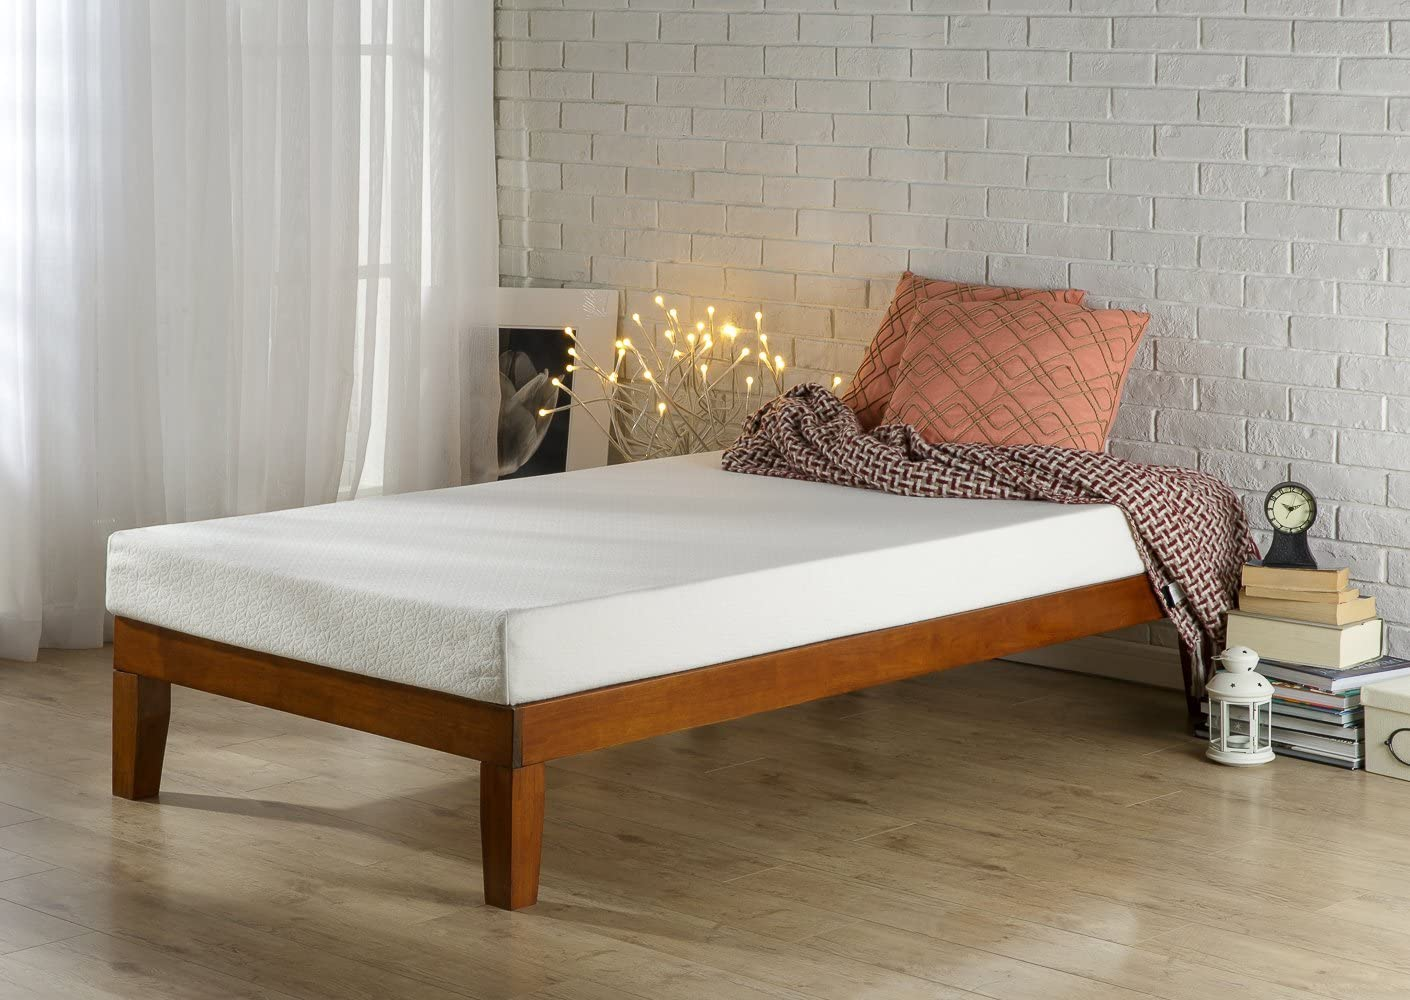 Zinus 12 Inch Wood Max 56% OFF Platform Bed Boxspring Fresno Mall Needed No Slat Su